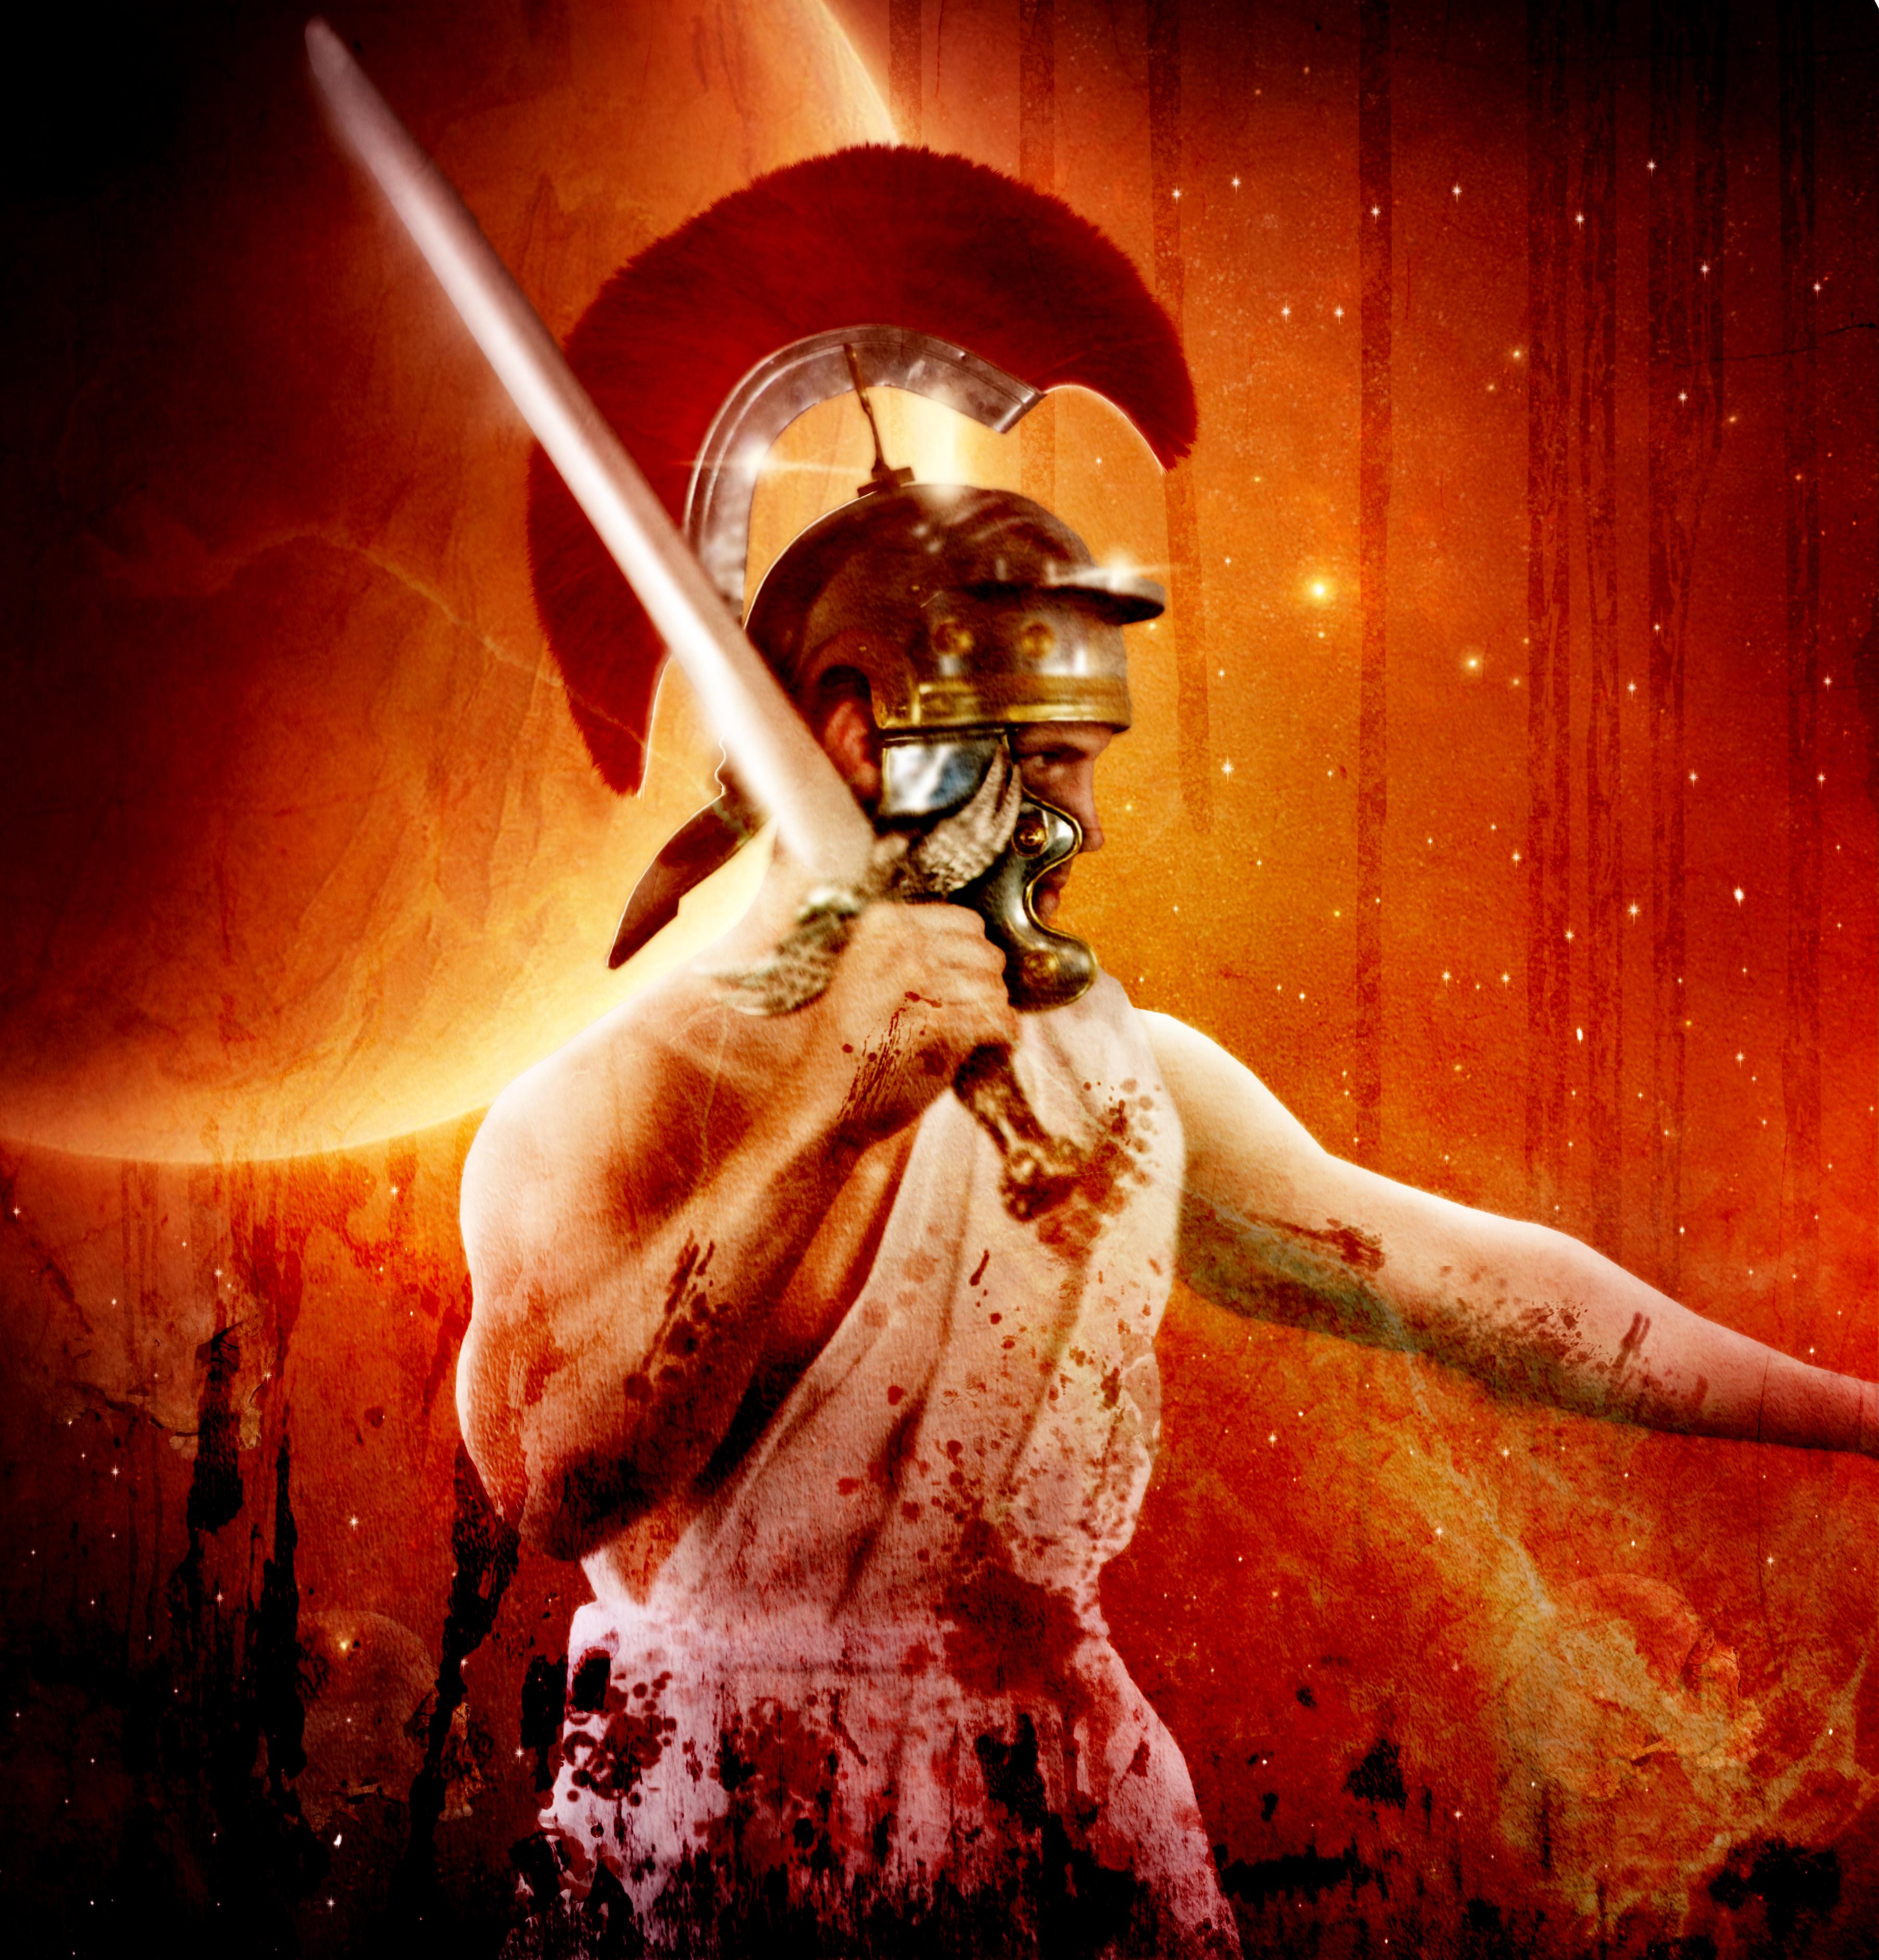 Mars, God of War by GhostsandDecay on DeviantArt